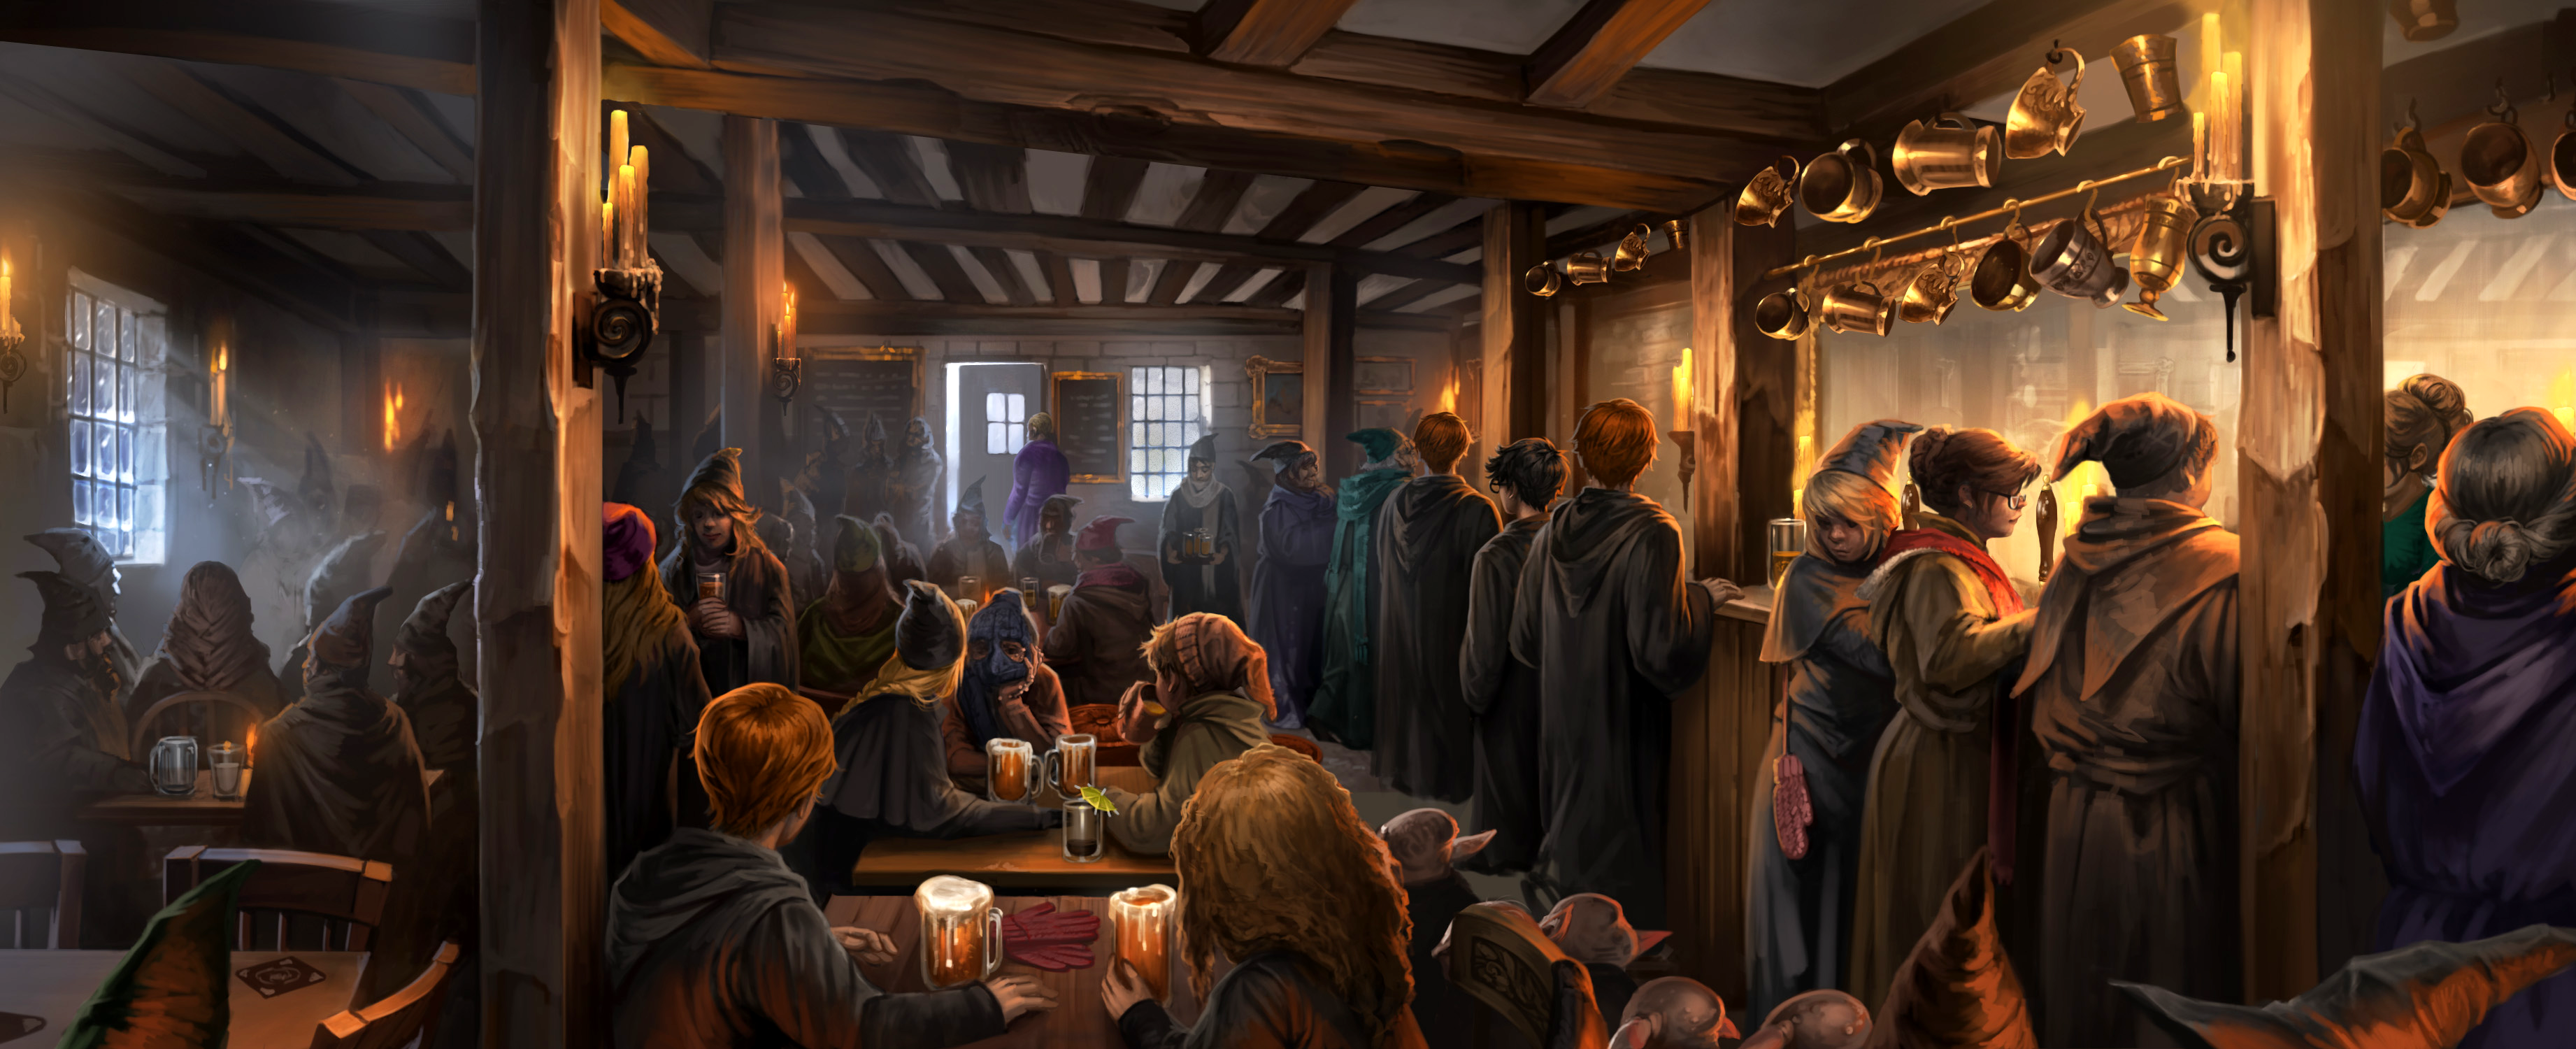 Les Trois Balais Three_Broomsticks_Inn_Pottermore